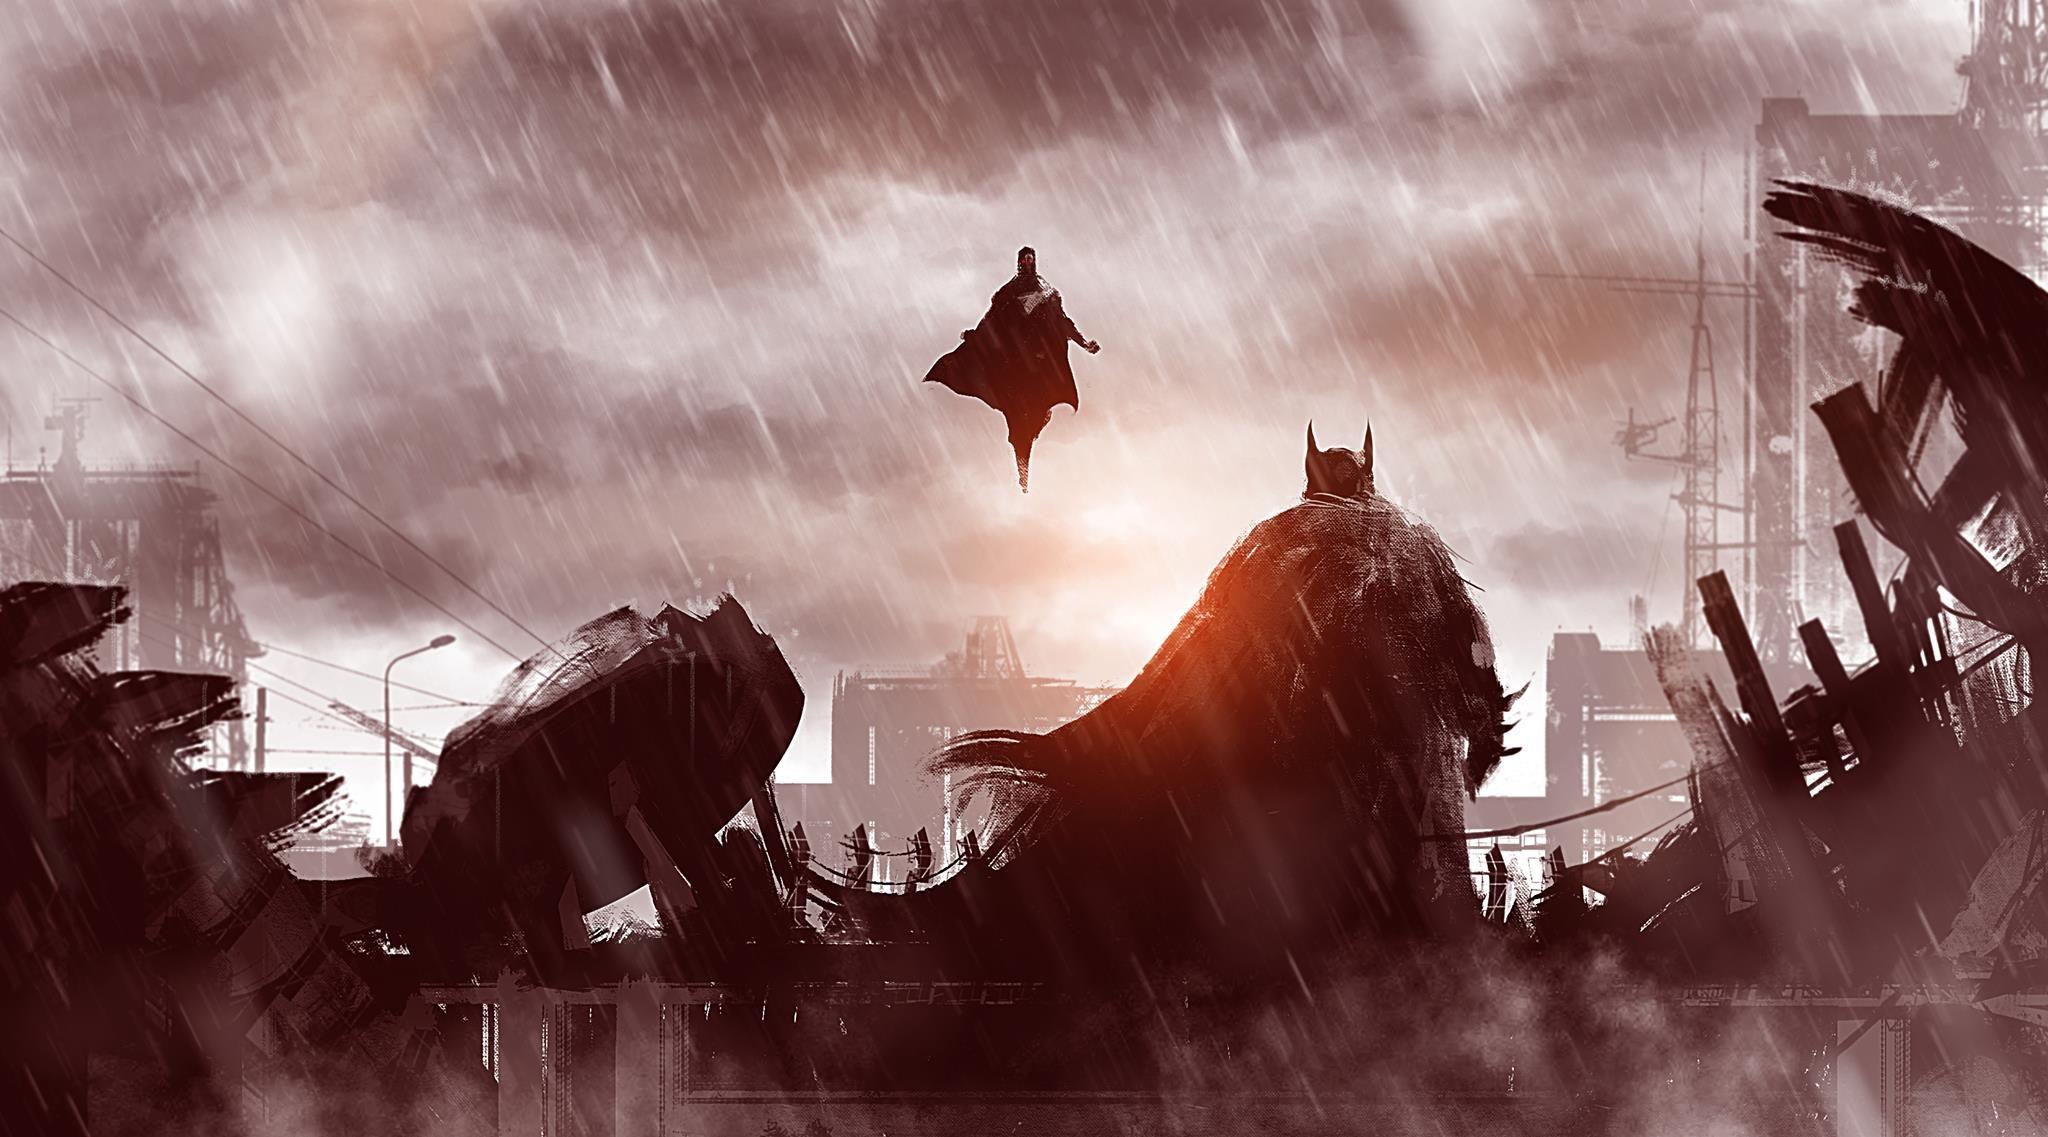 amazing batman v superman wallpaper hd wallpaper from gallsource